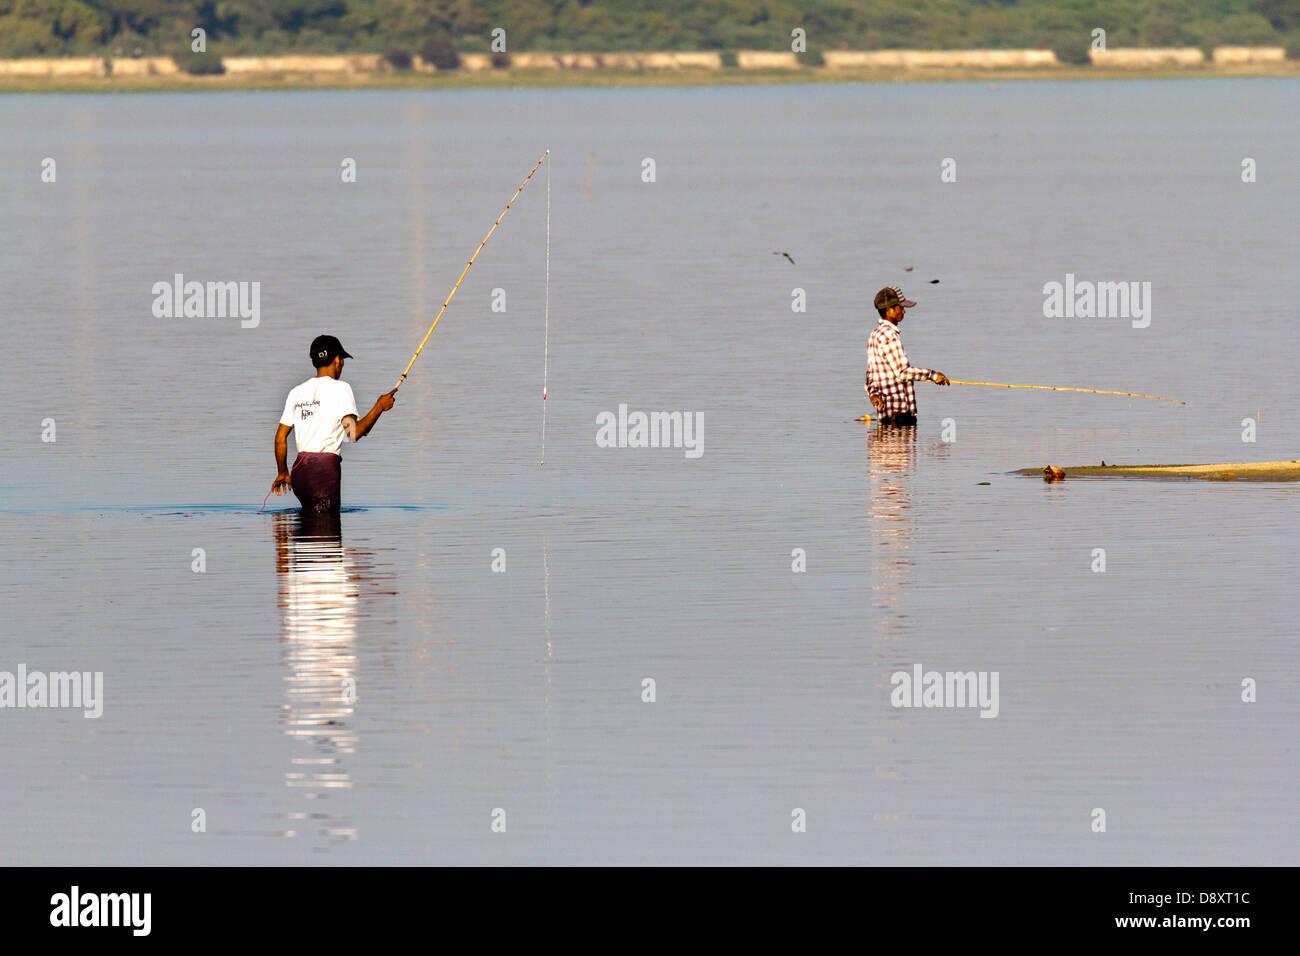 Fishermen trying their luck in Taungthaman Lake, Myanmar - Stock Image